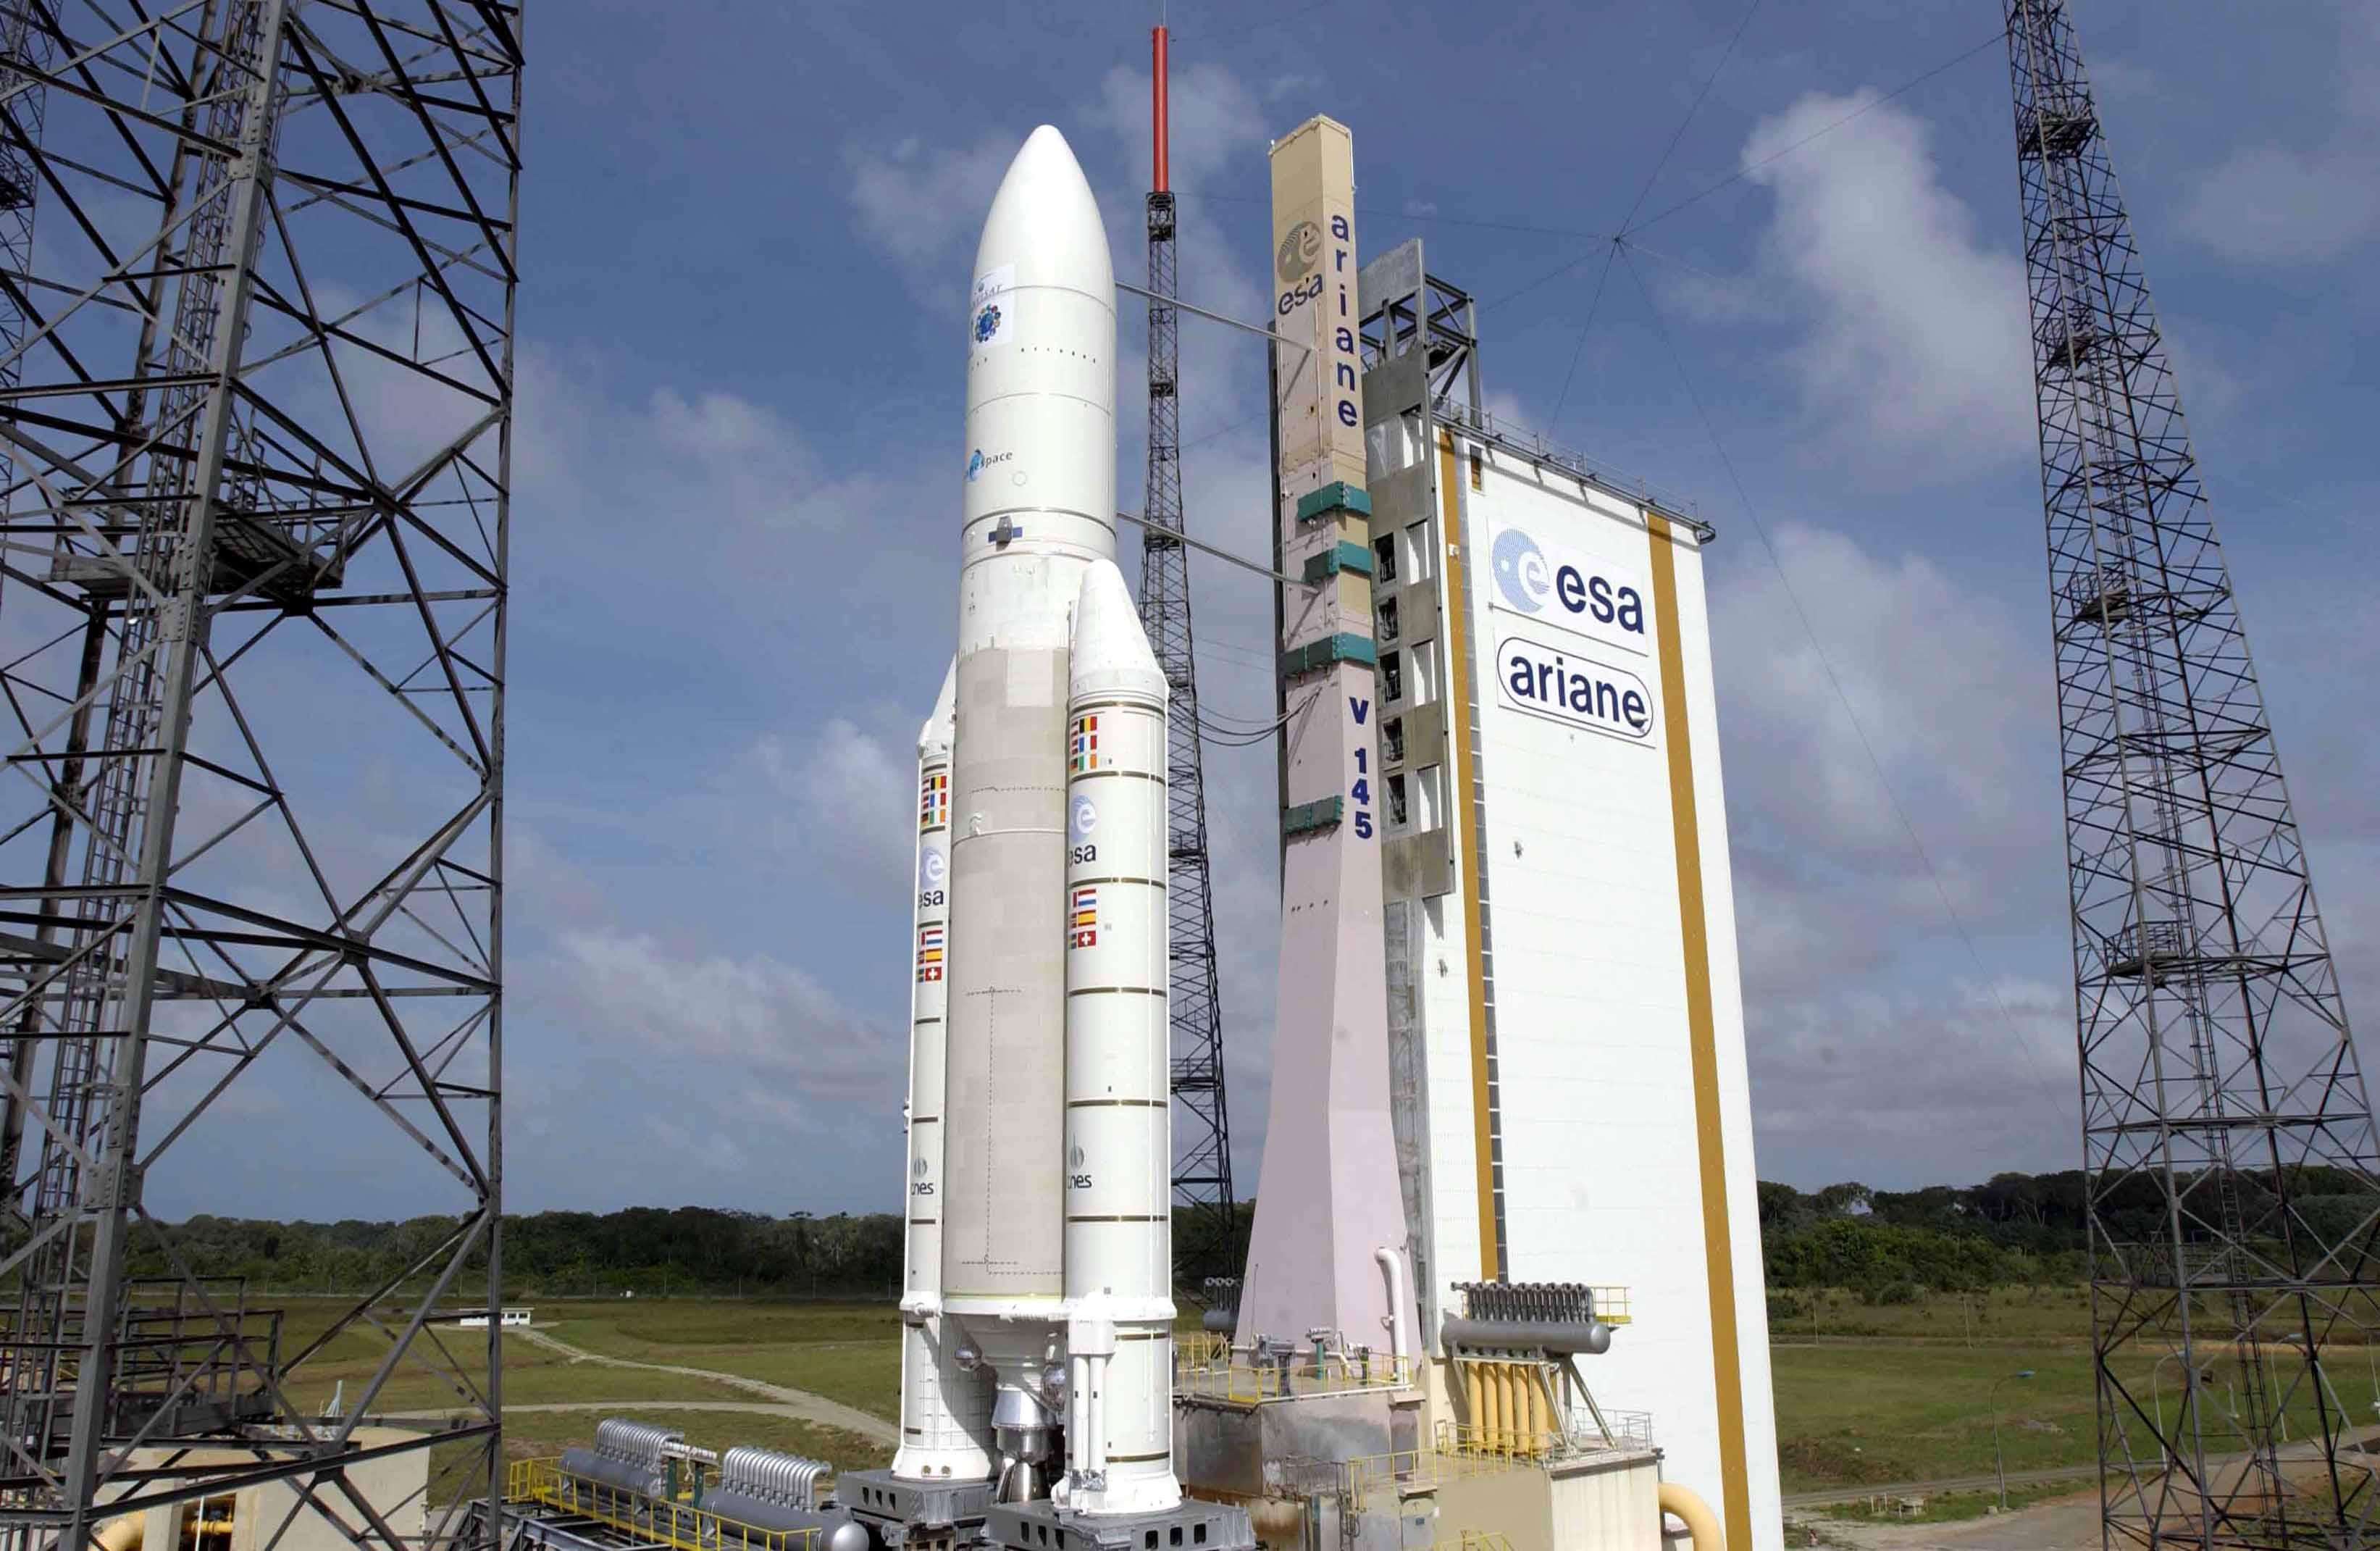 Ракета-носитель Ariane 5 благополучно стартовала скосмодрома Куру воФранции